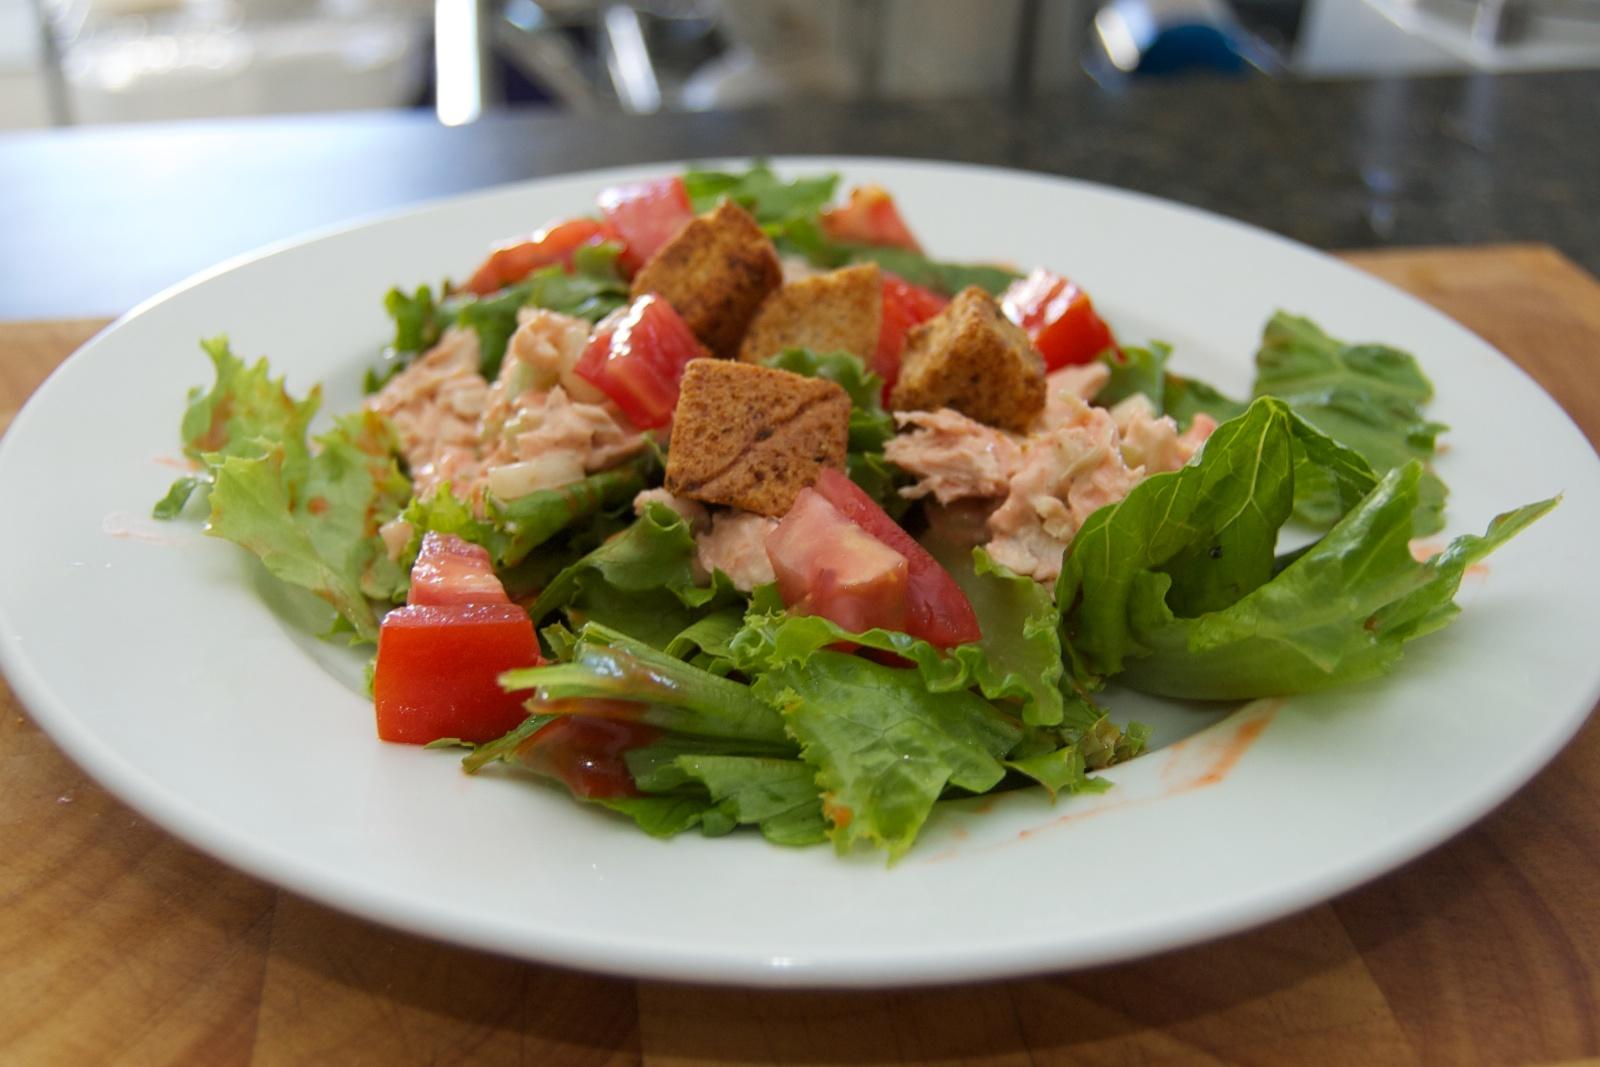 http://blog.rickk.com/food/2010/08/20/saladwithtunasalad.jpg